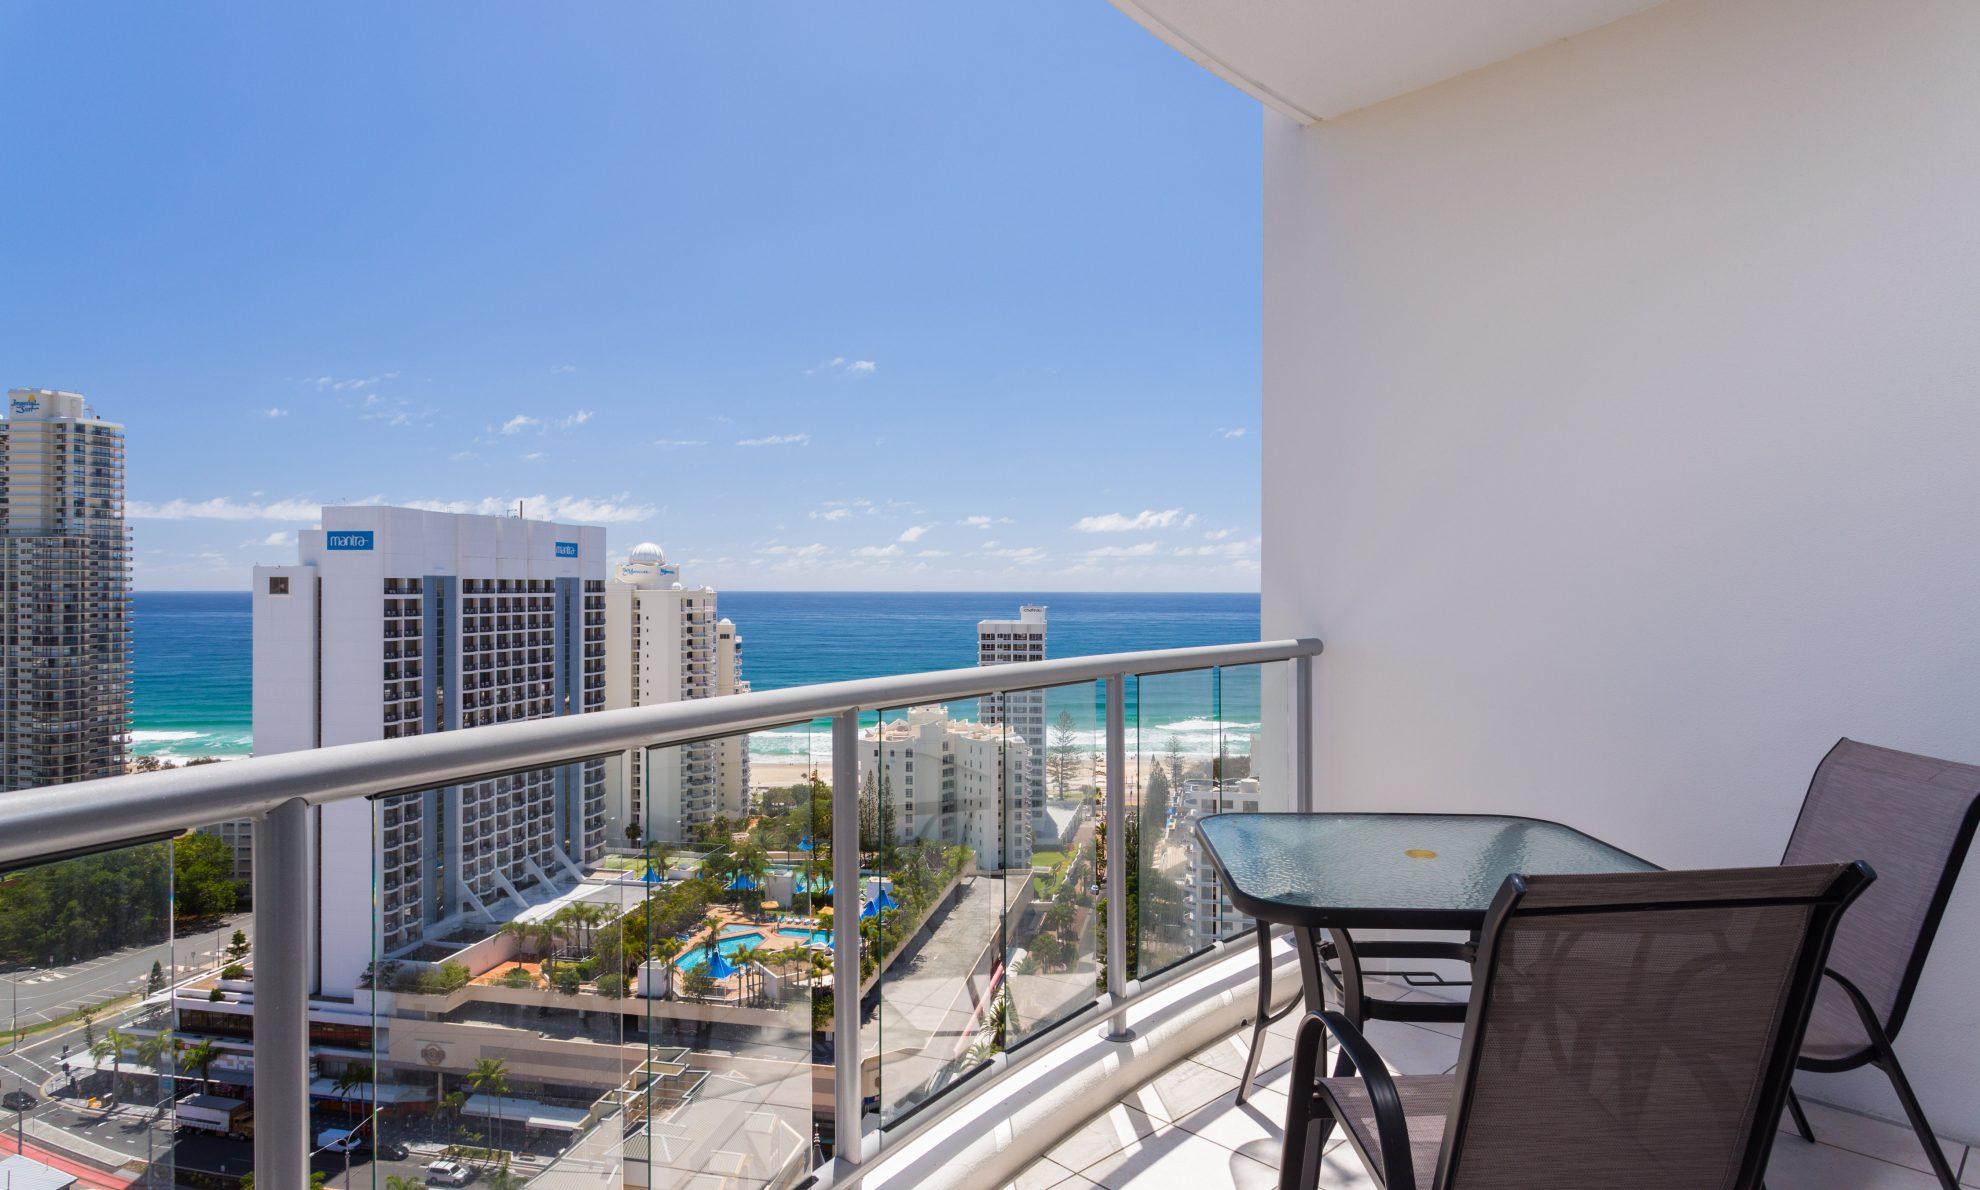 Chevron Renaissance 2222 balcony view